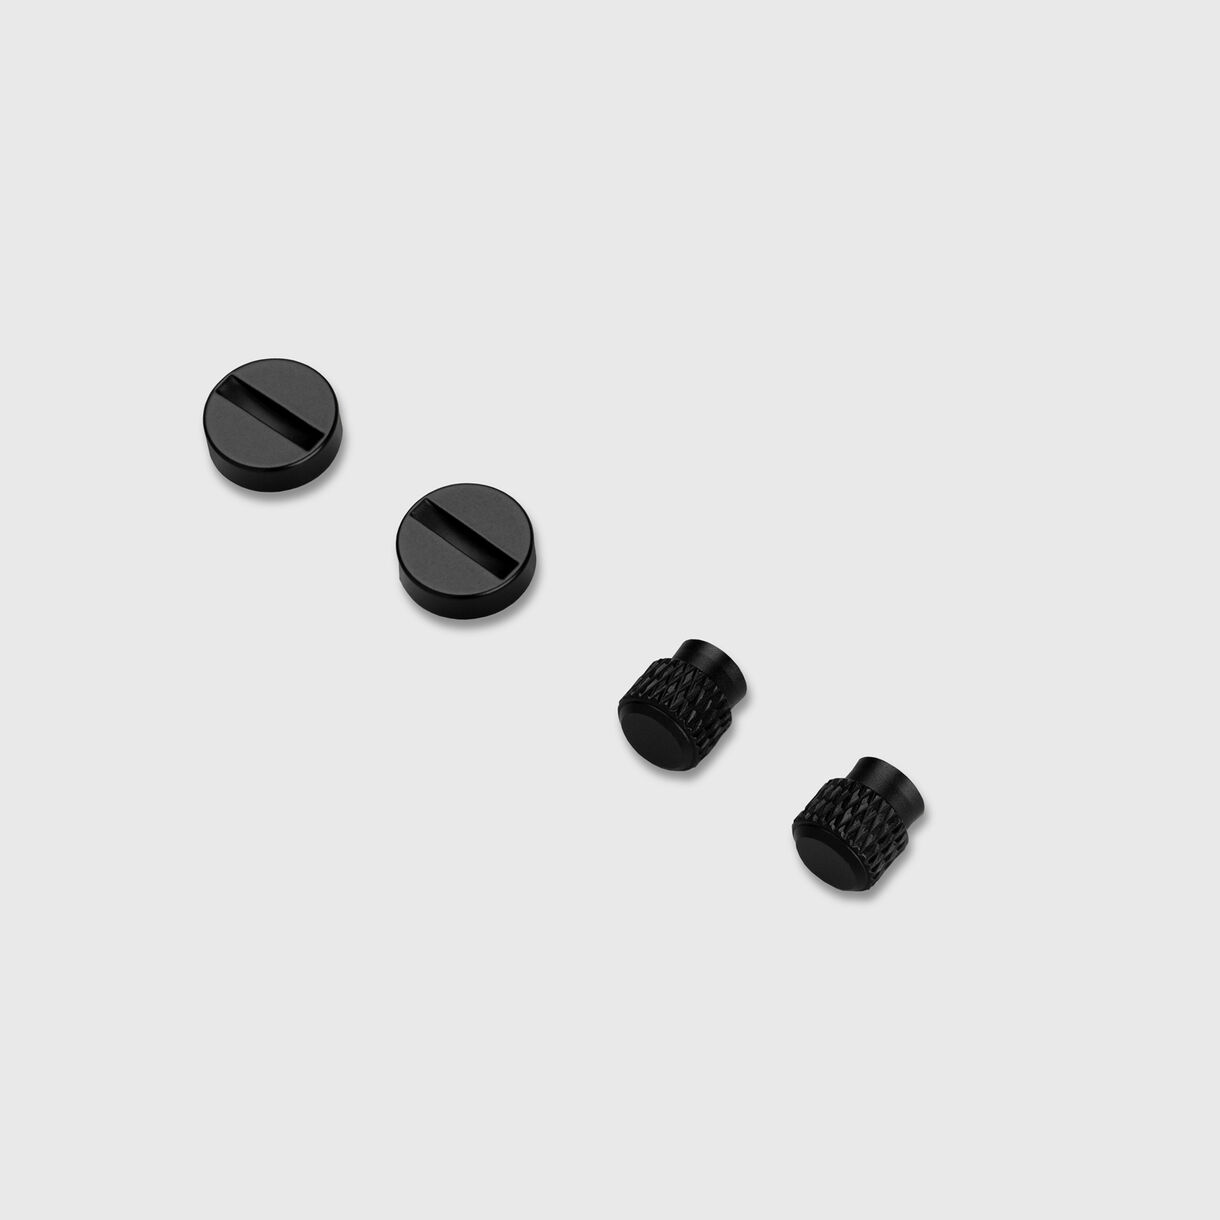 Socket Detail Kit, Black